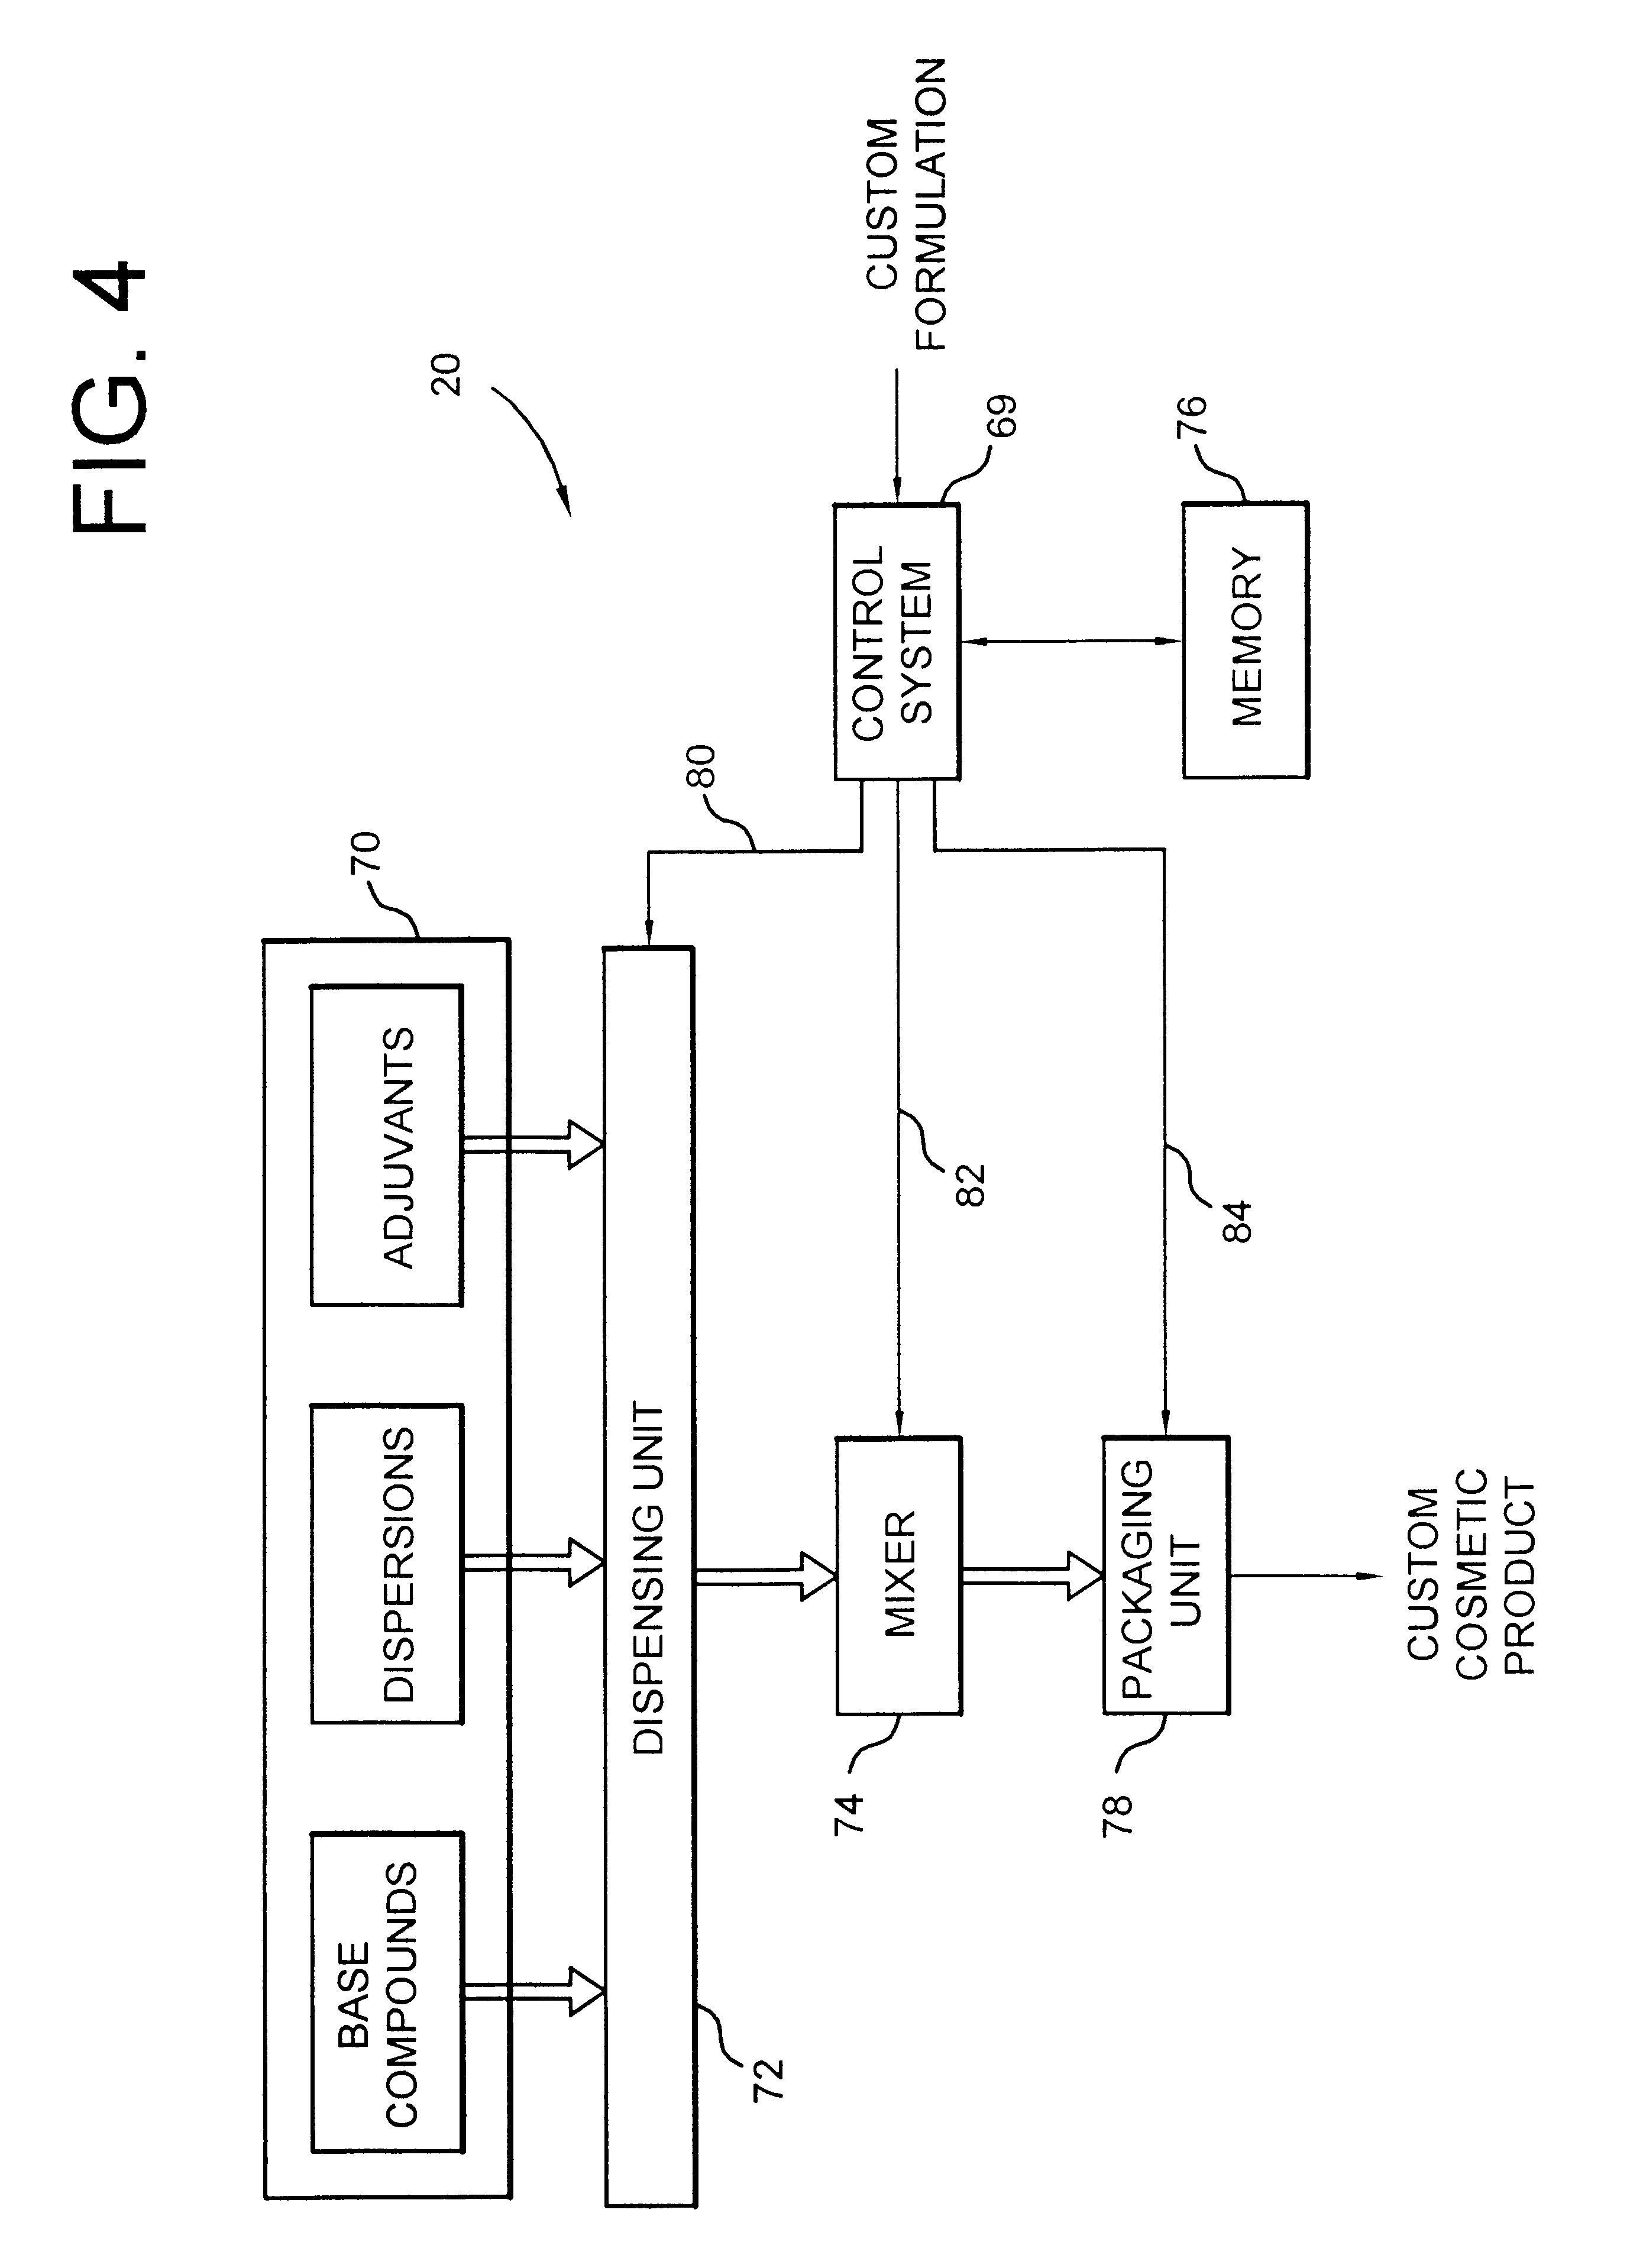 Patent US 6,782,307 B2 on